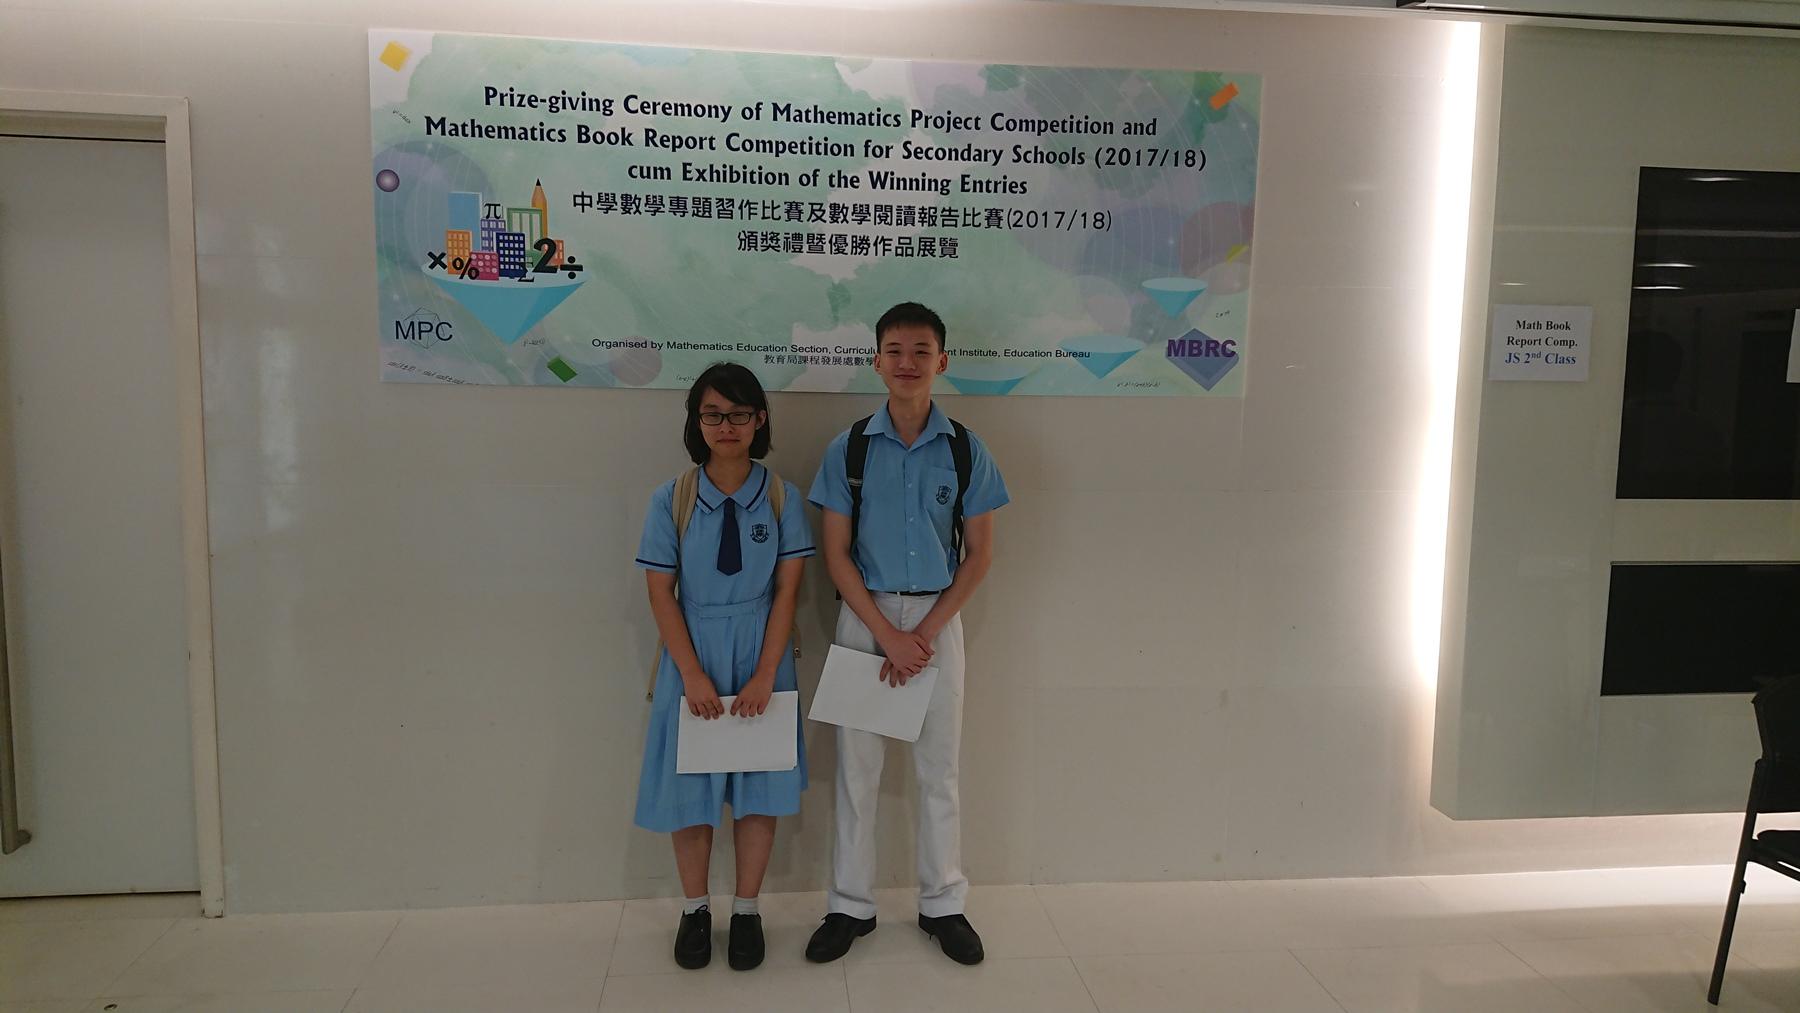 http://npc.edu.hk/sites/default/files/dsc_3007.jpg